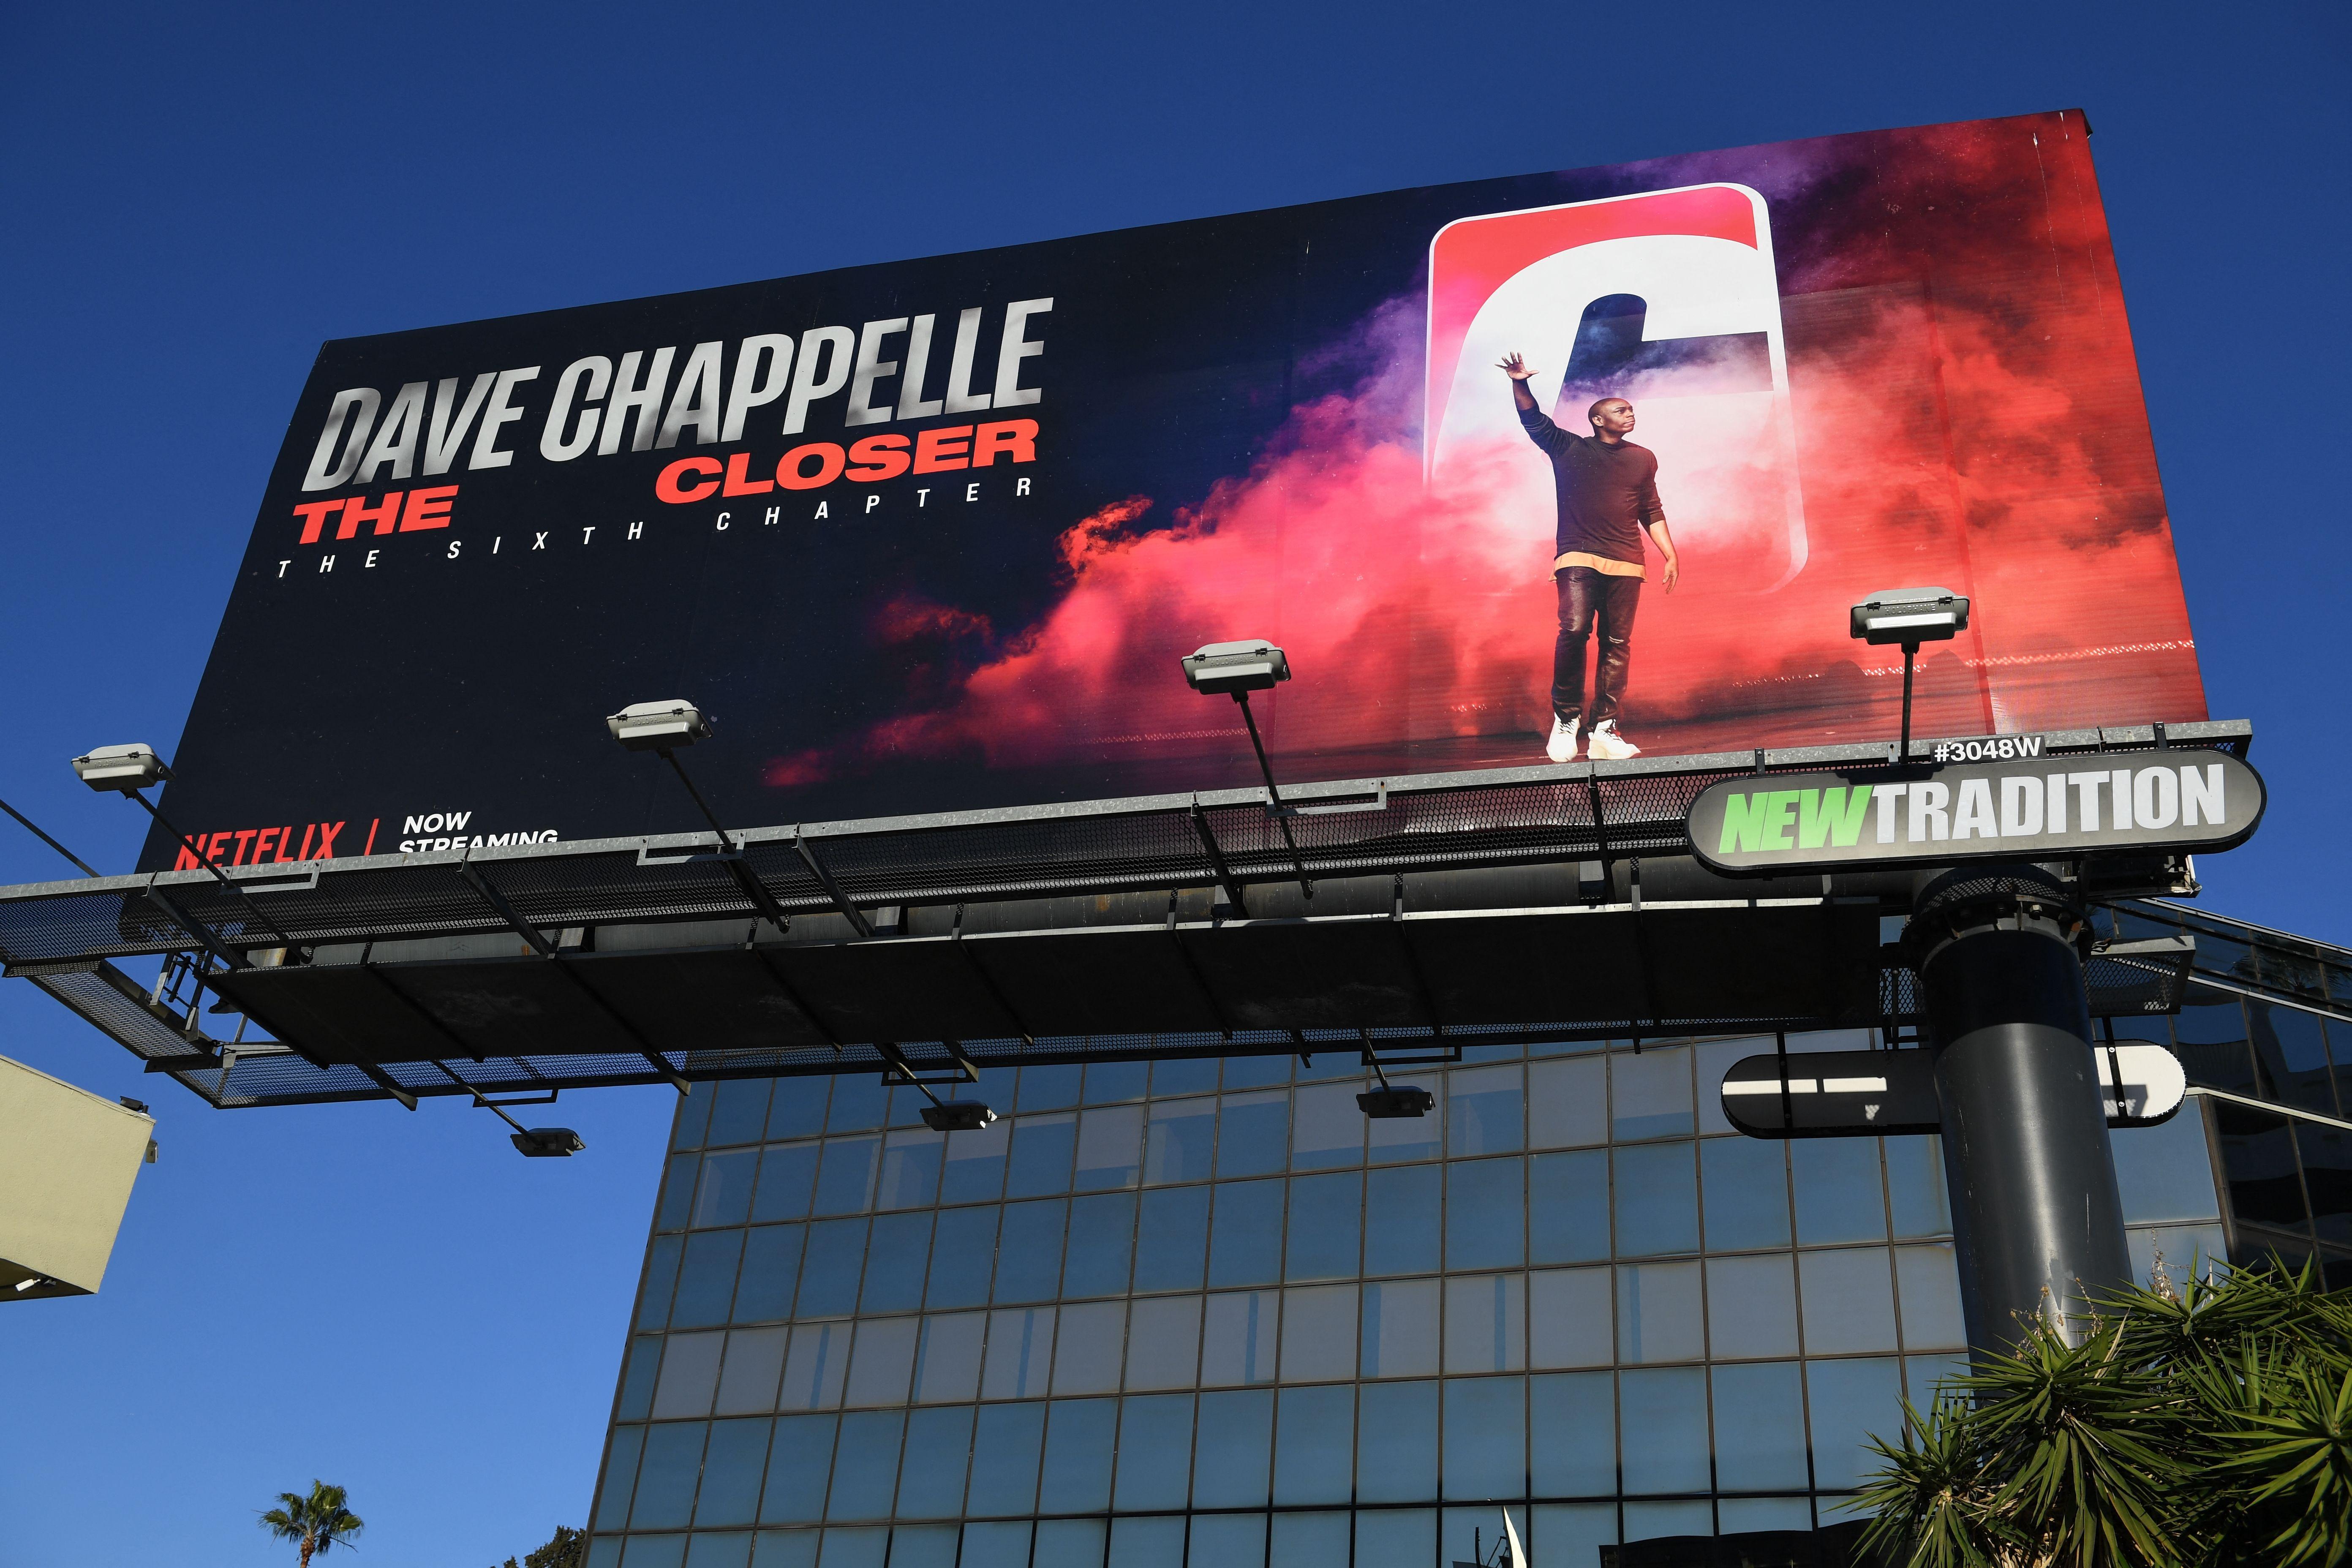 Un cartel para el especial de Dave Chappelle de Netflix The Closer se ve en Hollywood, California, el 12 de octubre de 2021.